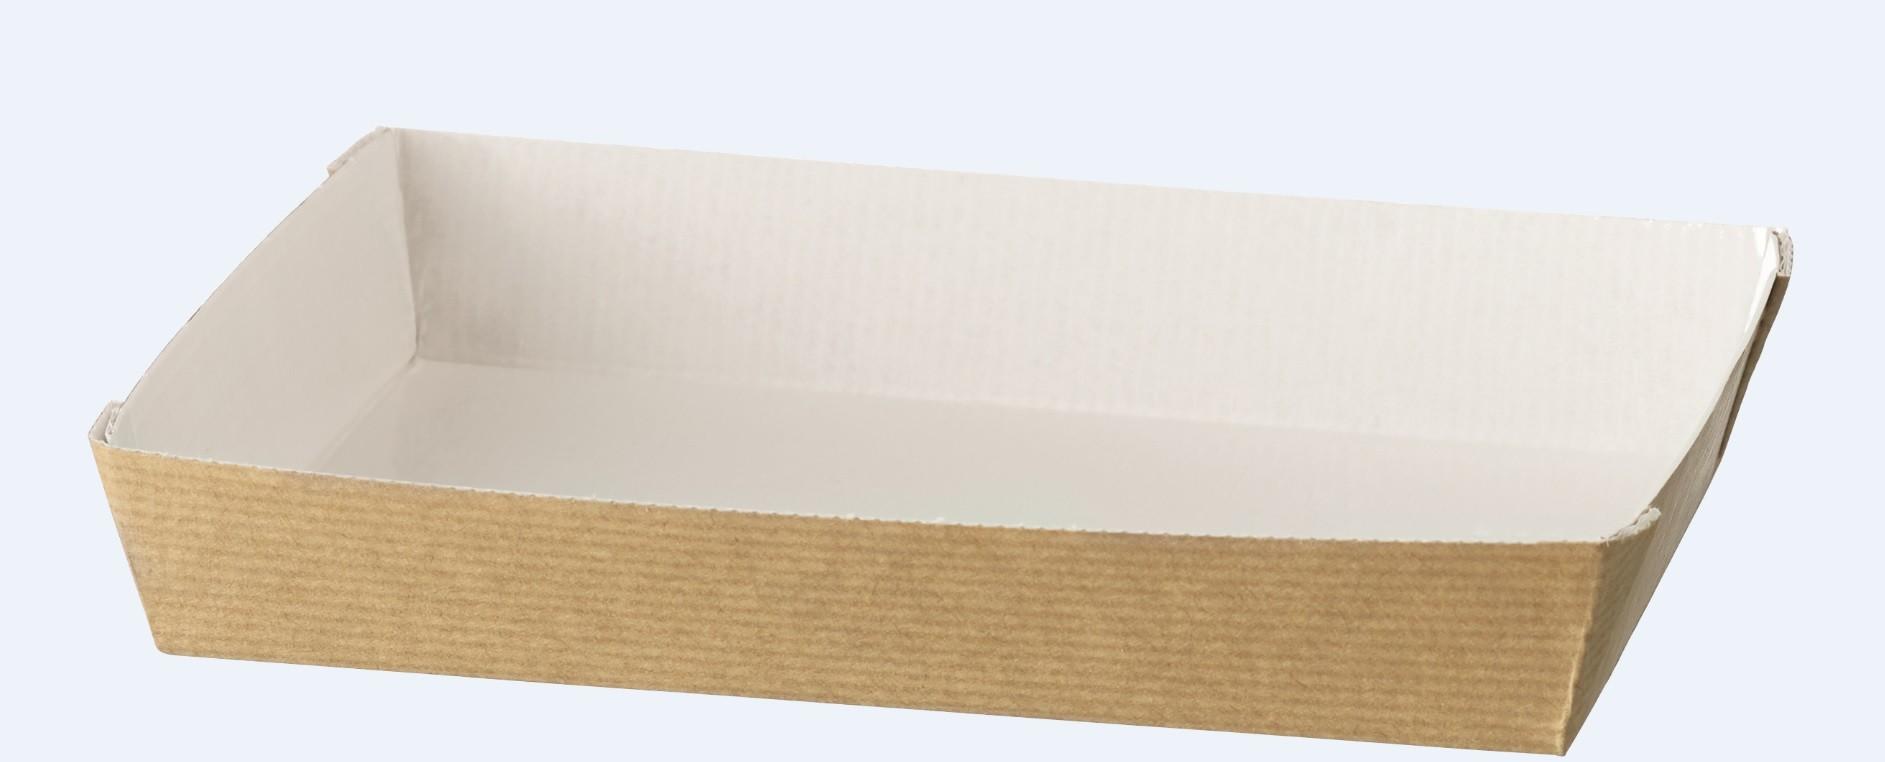 Assiette cubik 180x130 NATURAL COMATEC